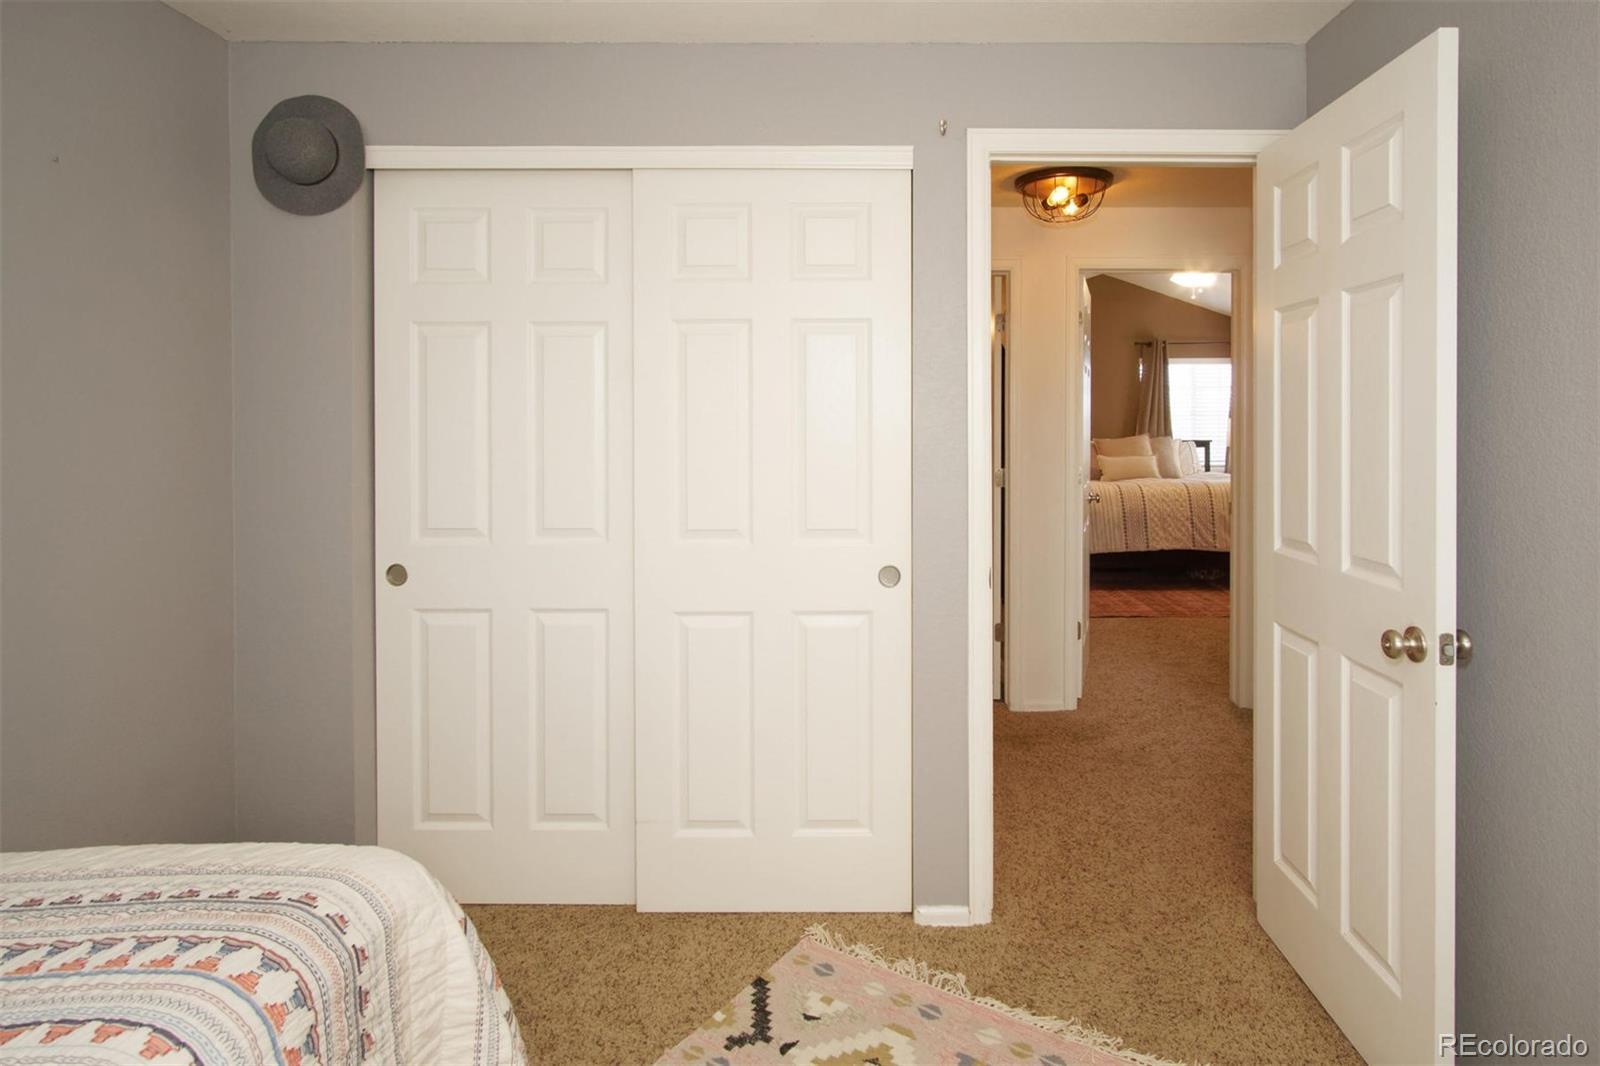 MLS# 1588259 - 22 - 11326 W Crestline Drive, Littleton, CO 80127